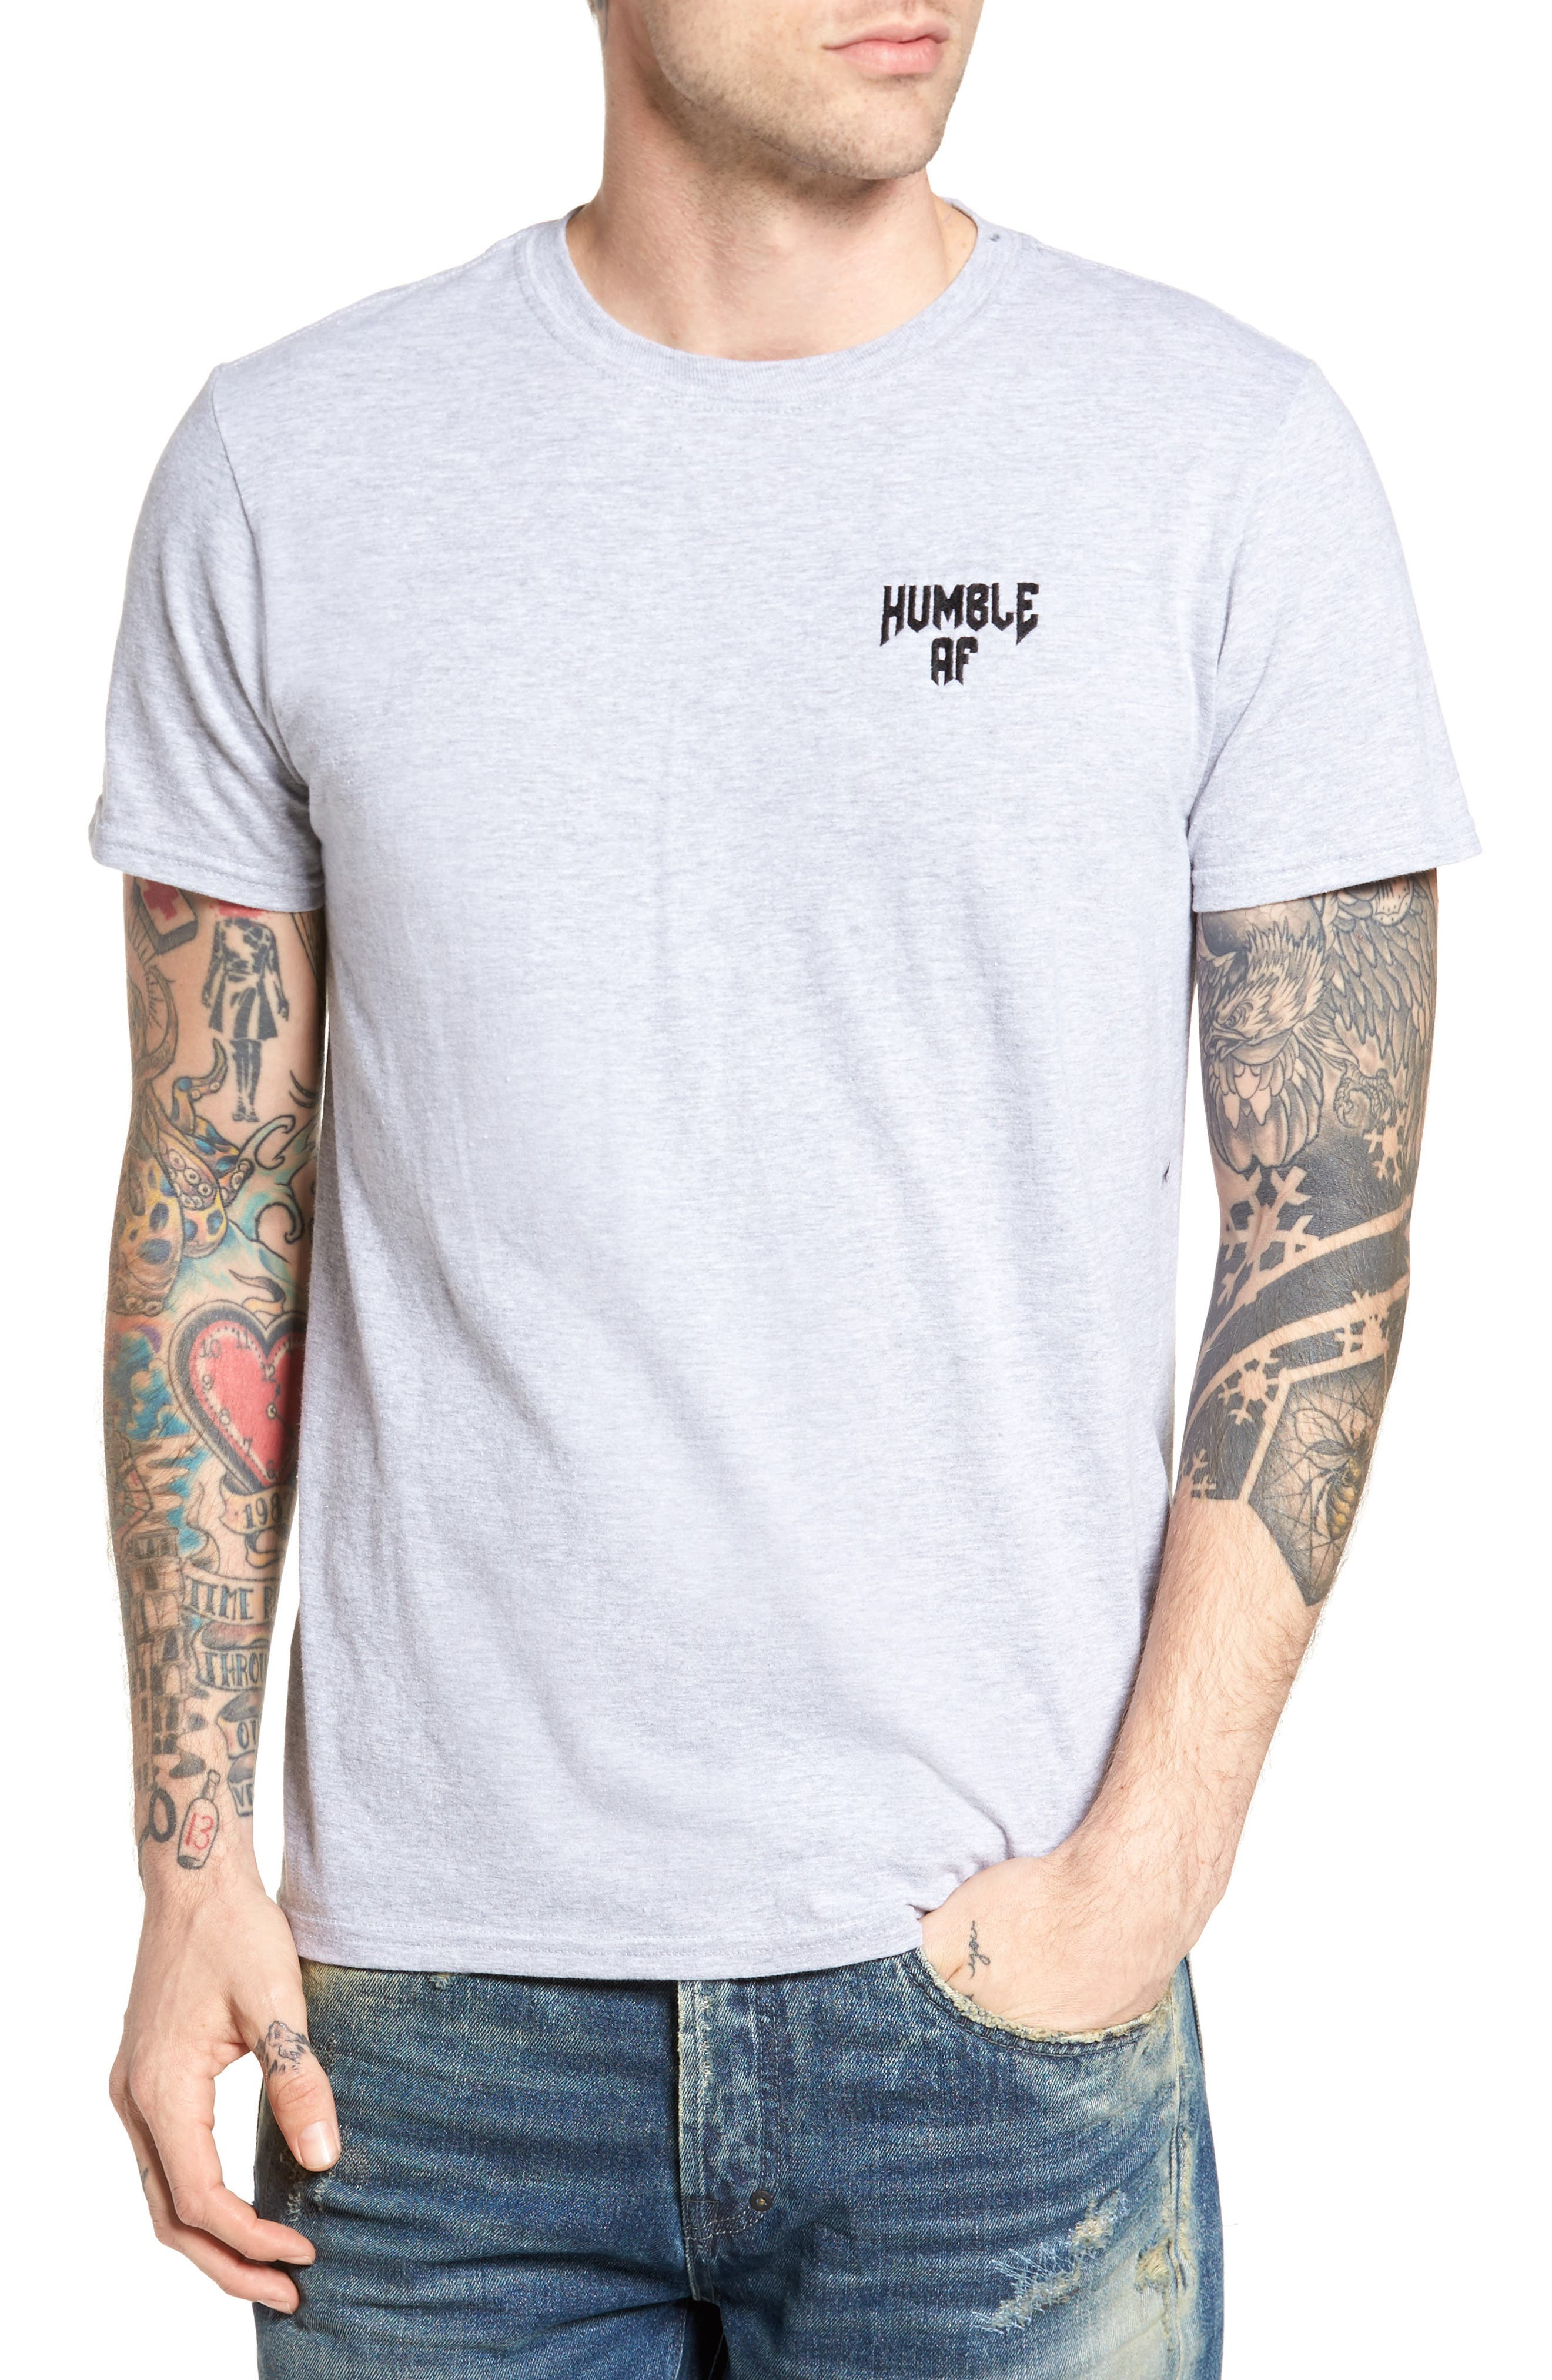 Main Image - The Rail Humble AF T-Shirt